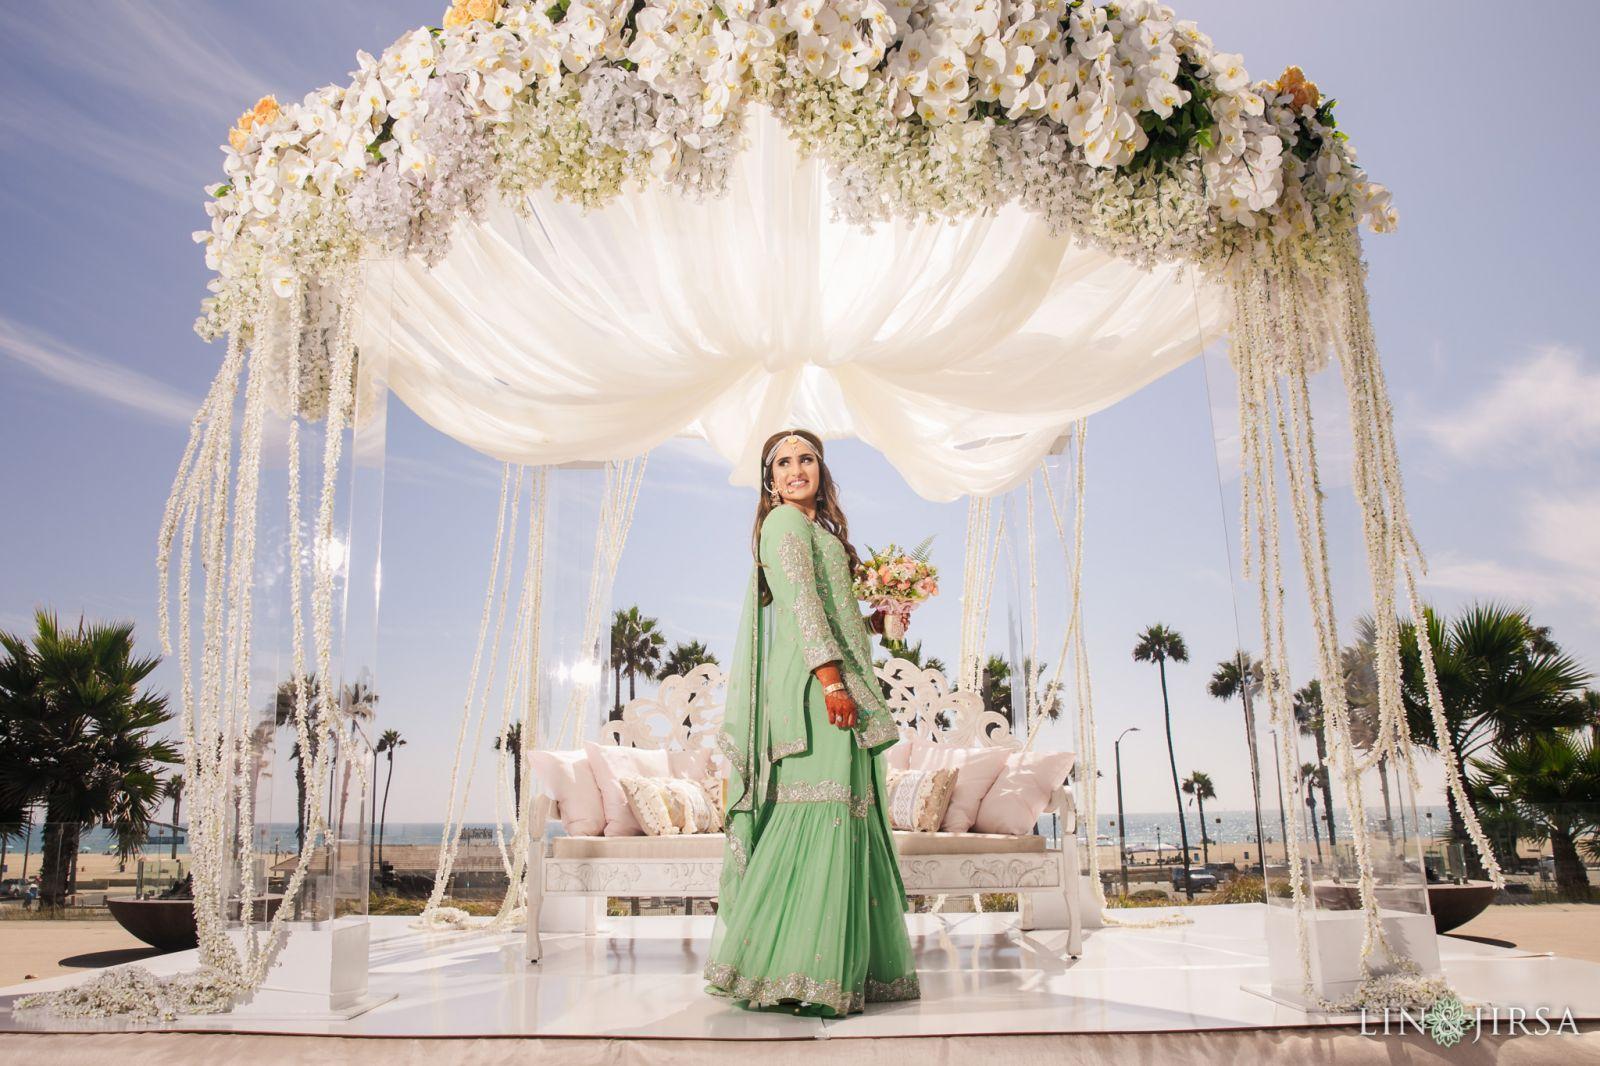 kismet-wedding-inspiration-pics-40.jpg